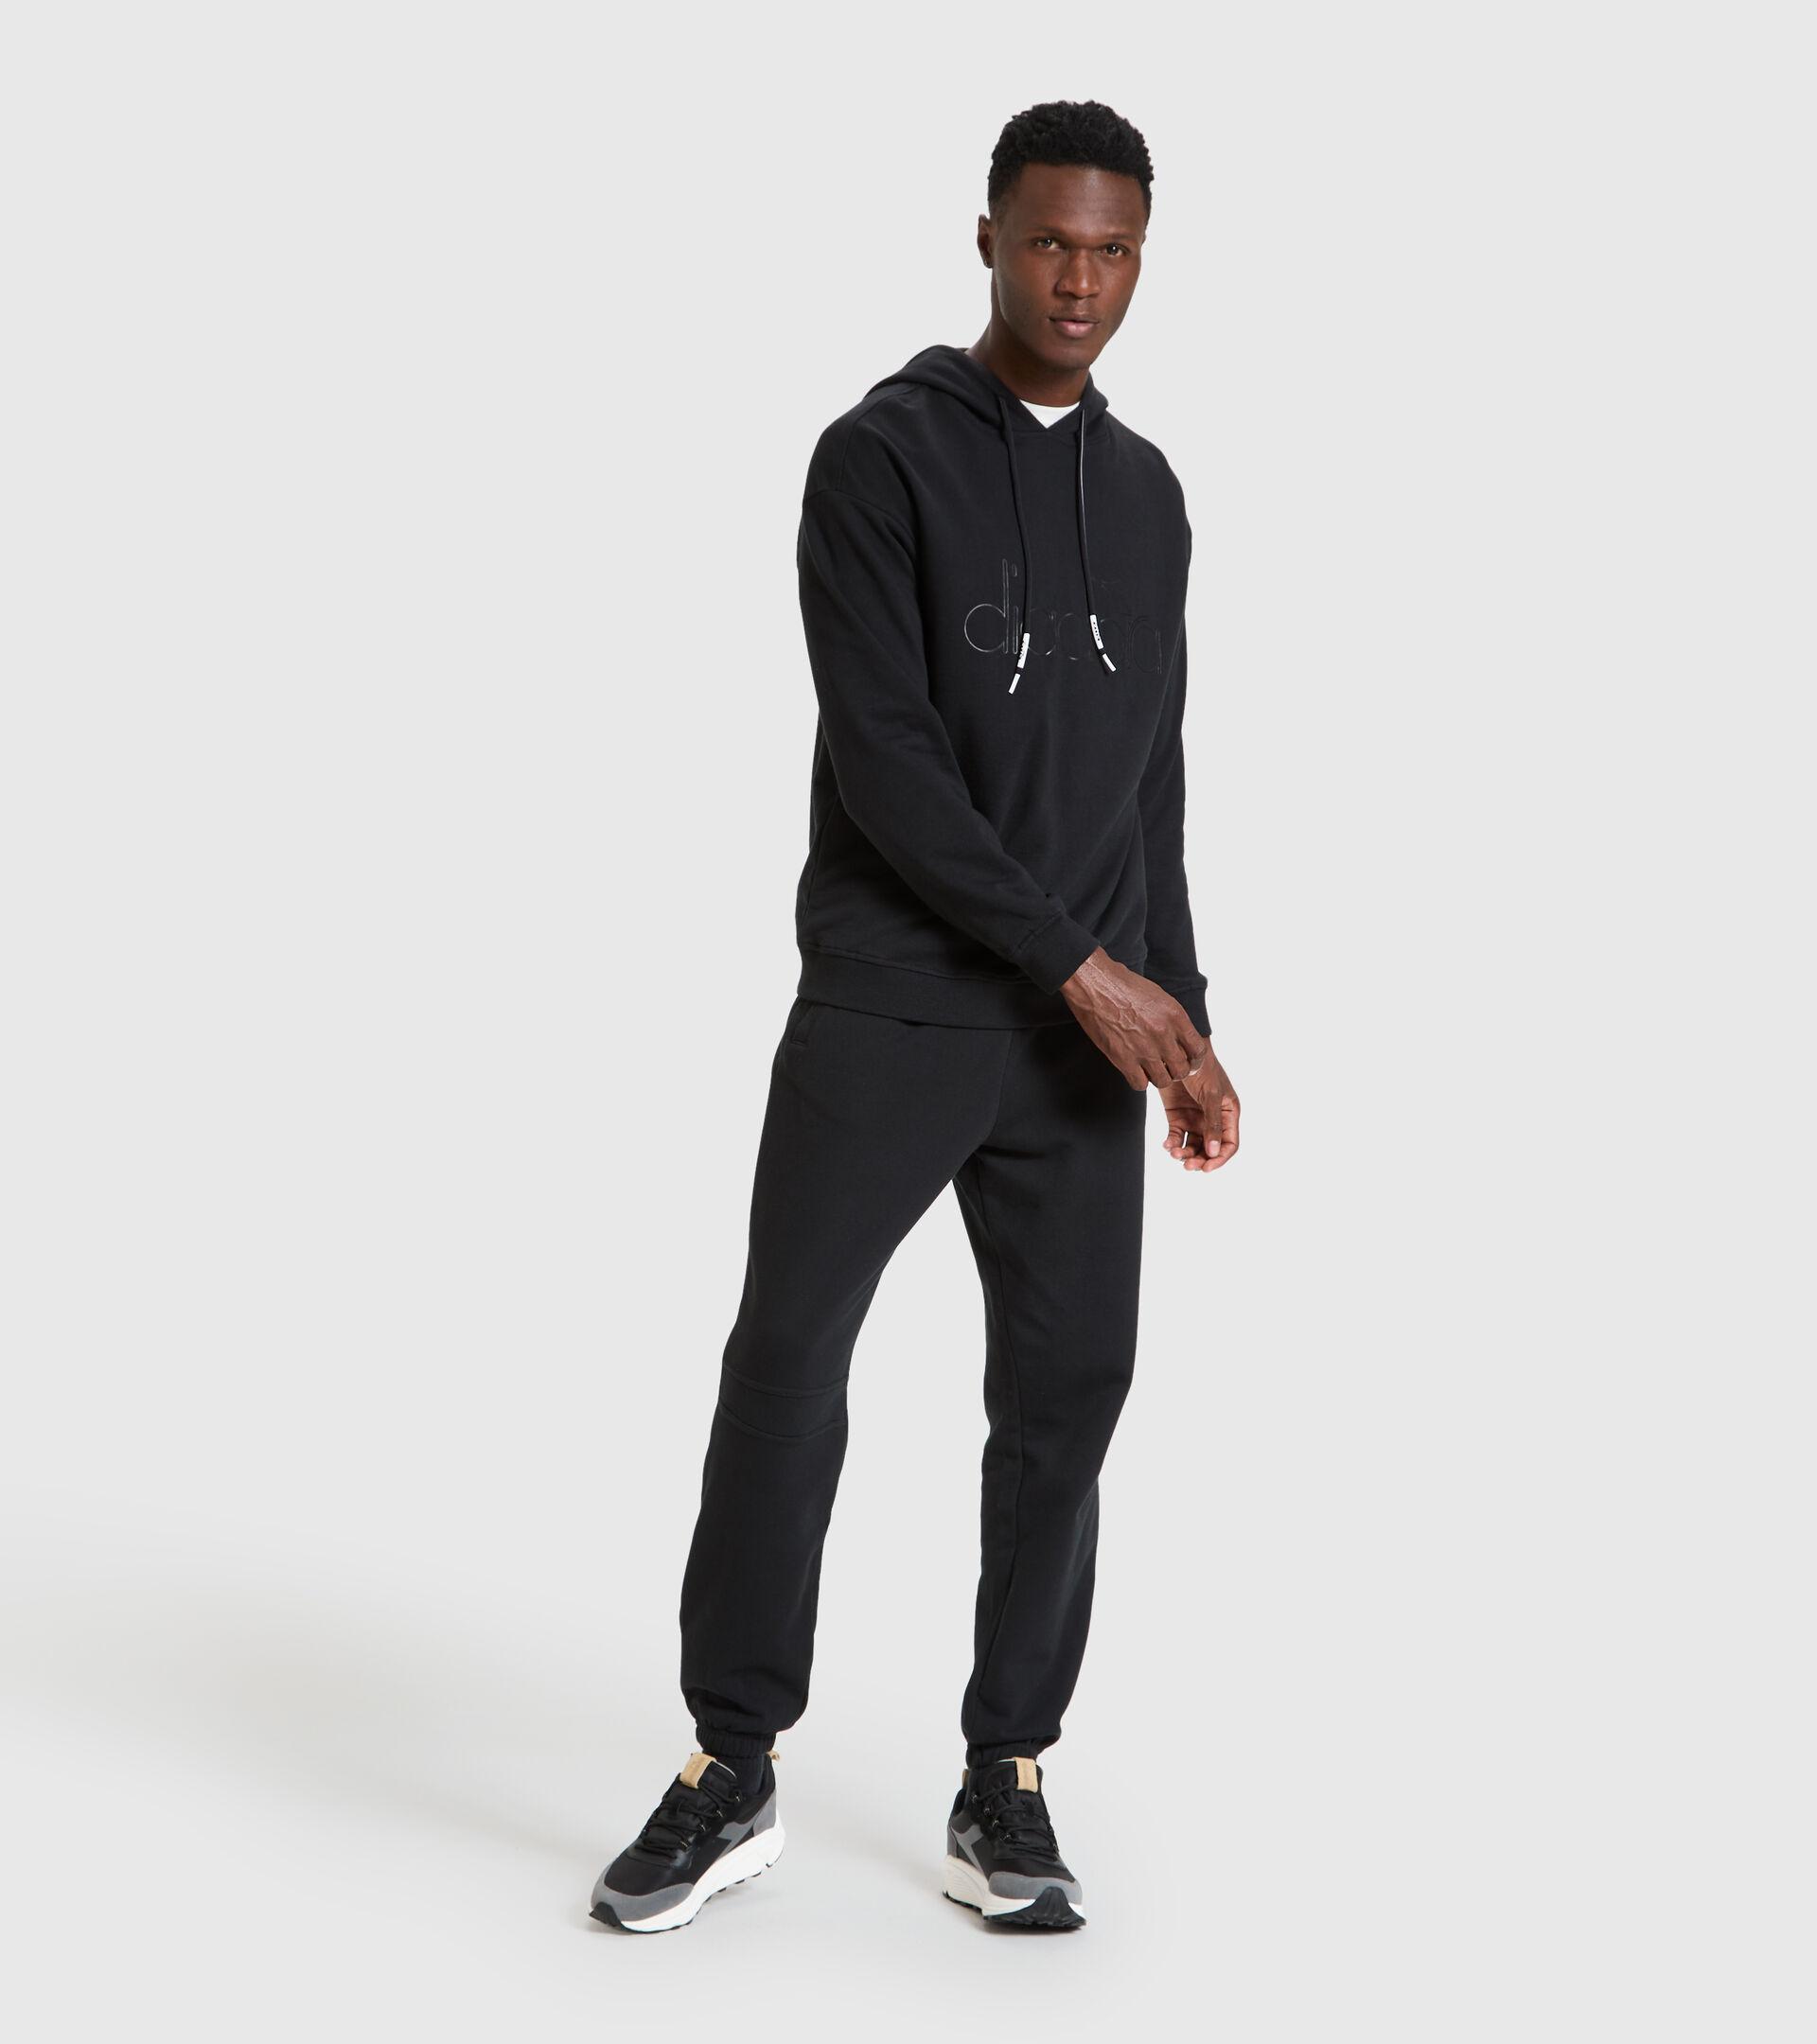 Pantalones deportivos - Unisex PANT SQUADRA NEGRO - Diadora